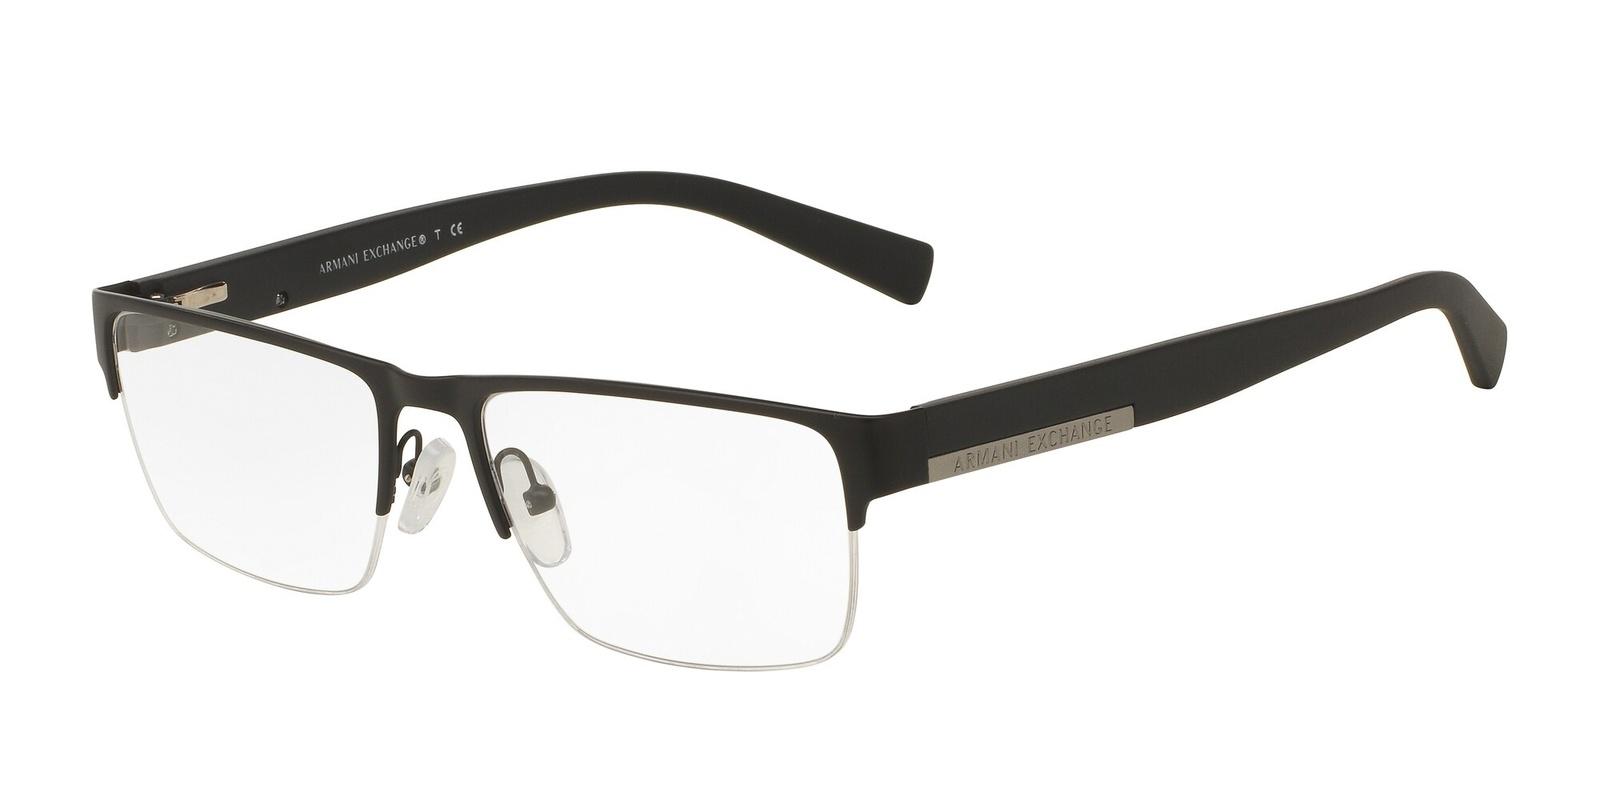 Armani Exchange AX1018 Eyeglasses